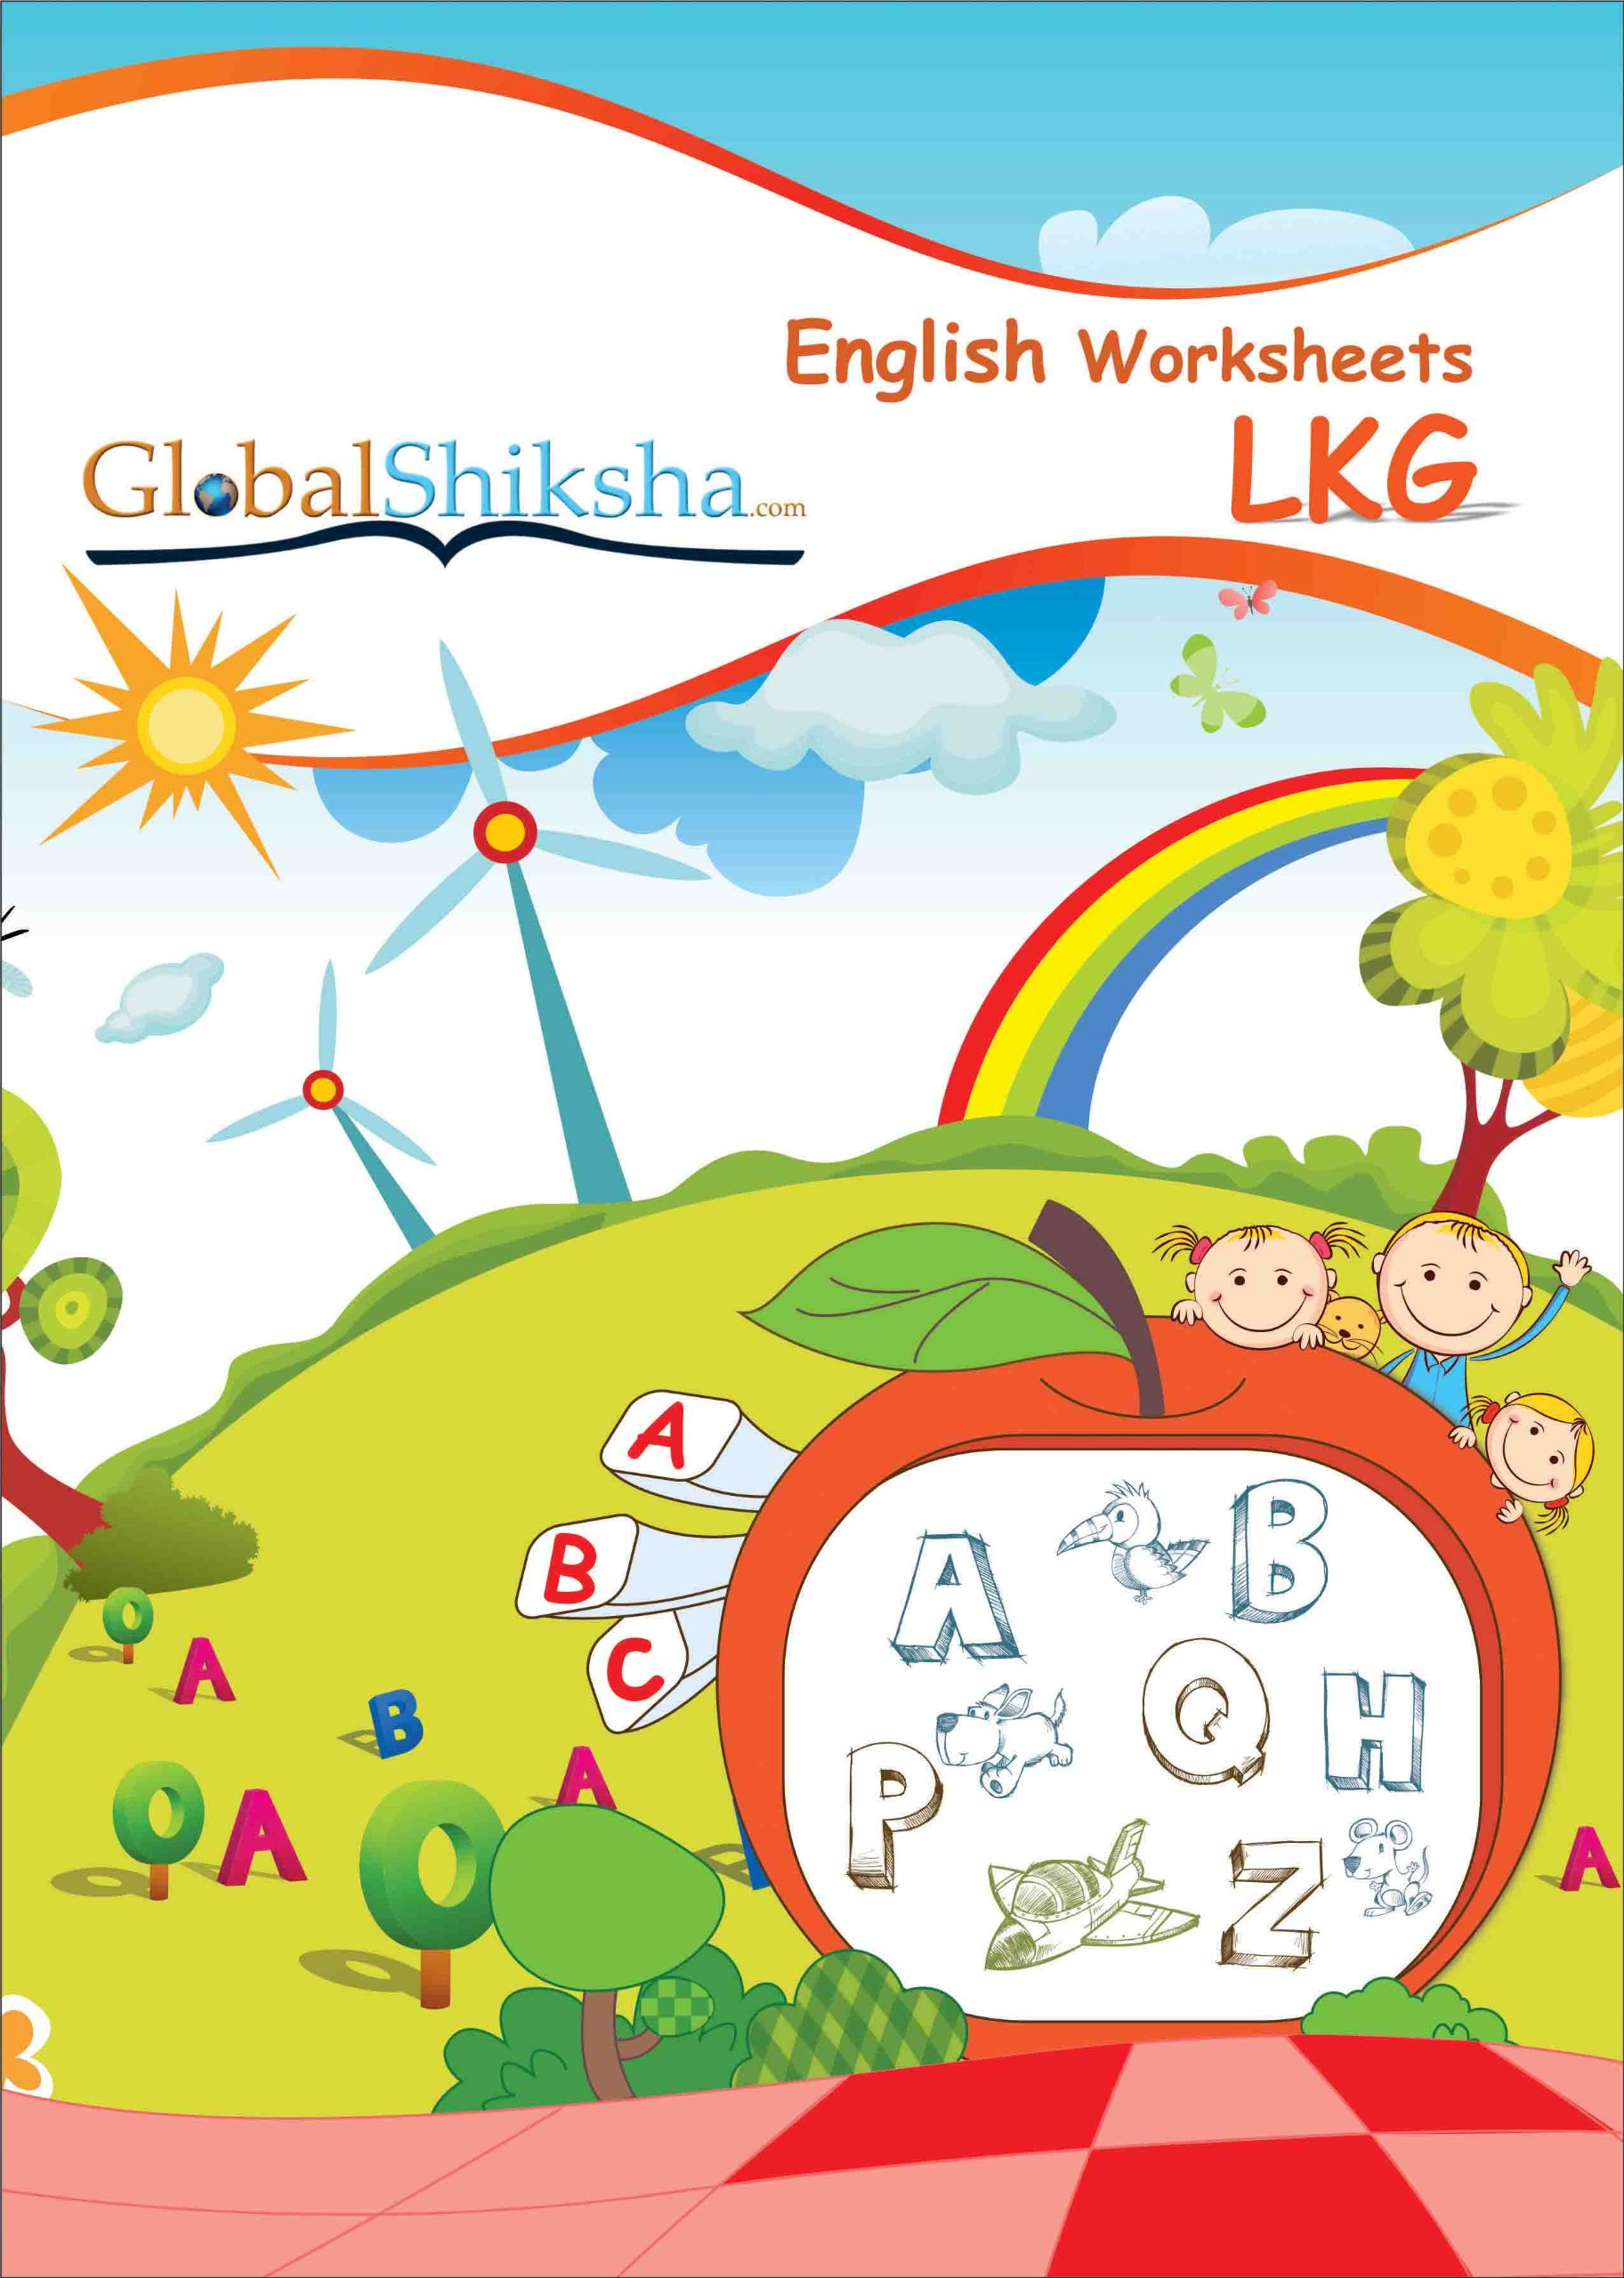 Lkg Worksheets English Free